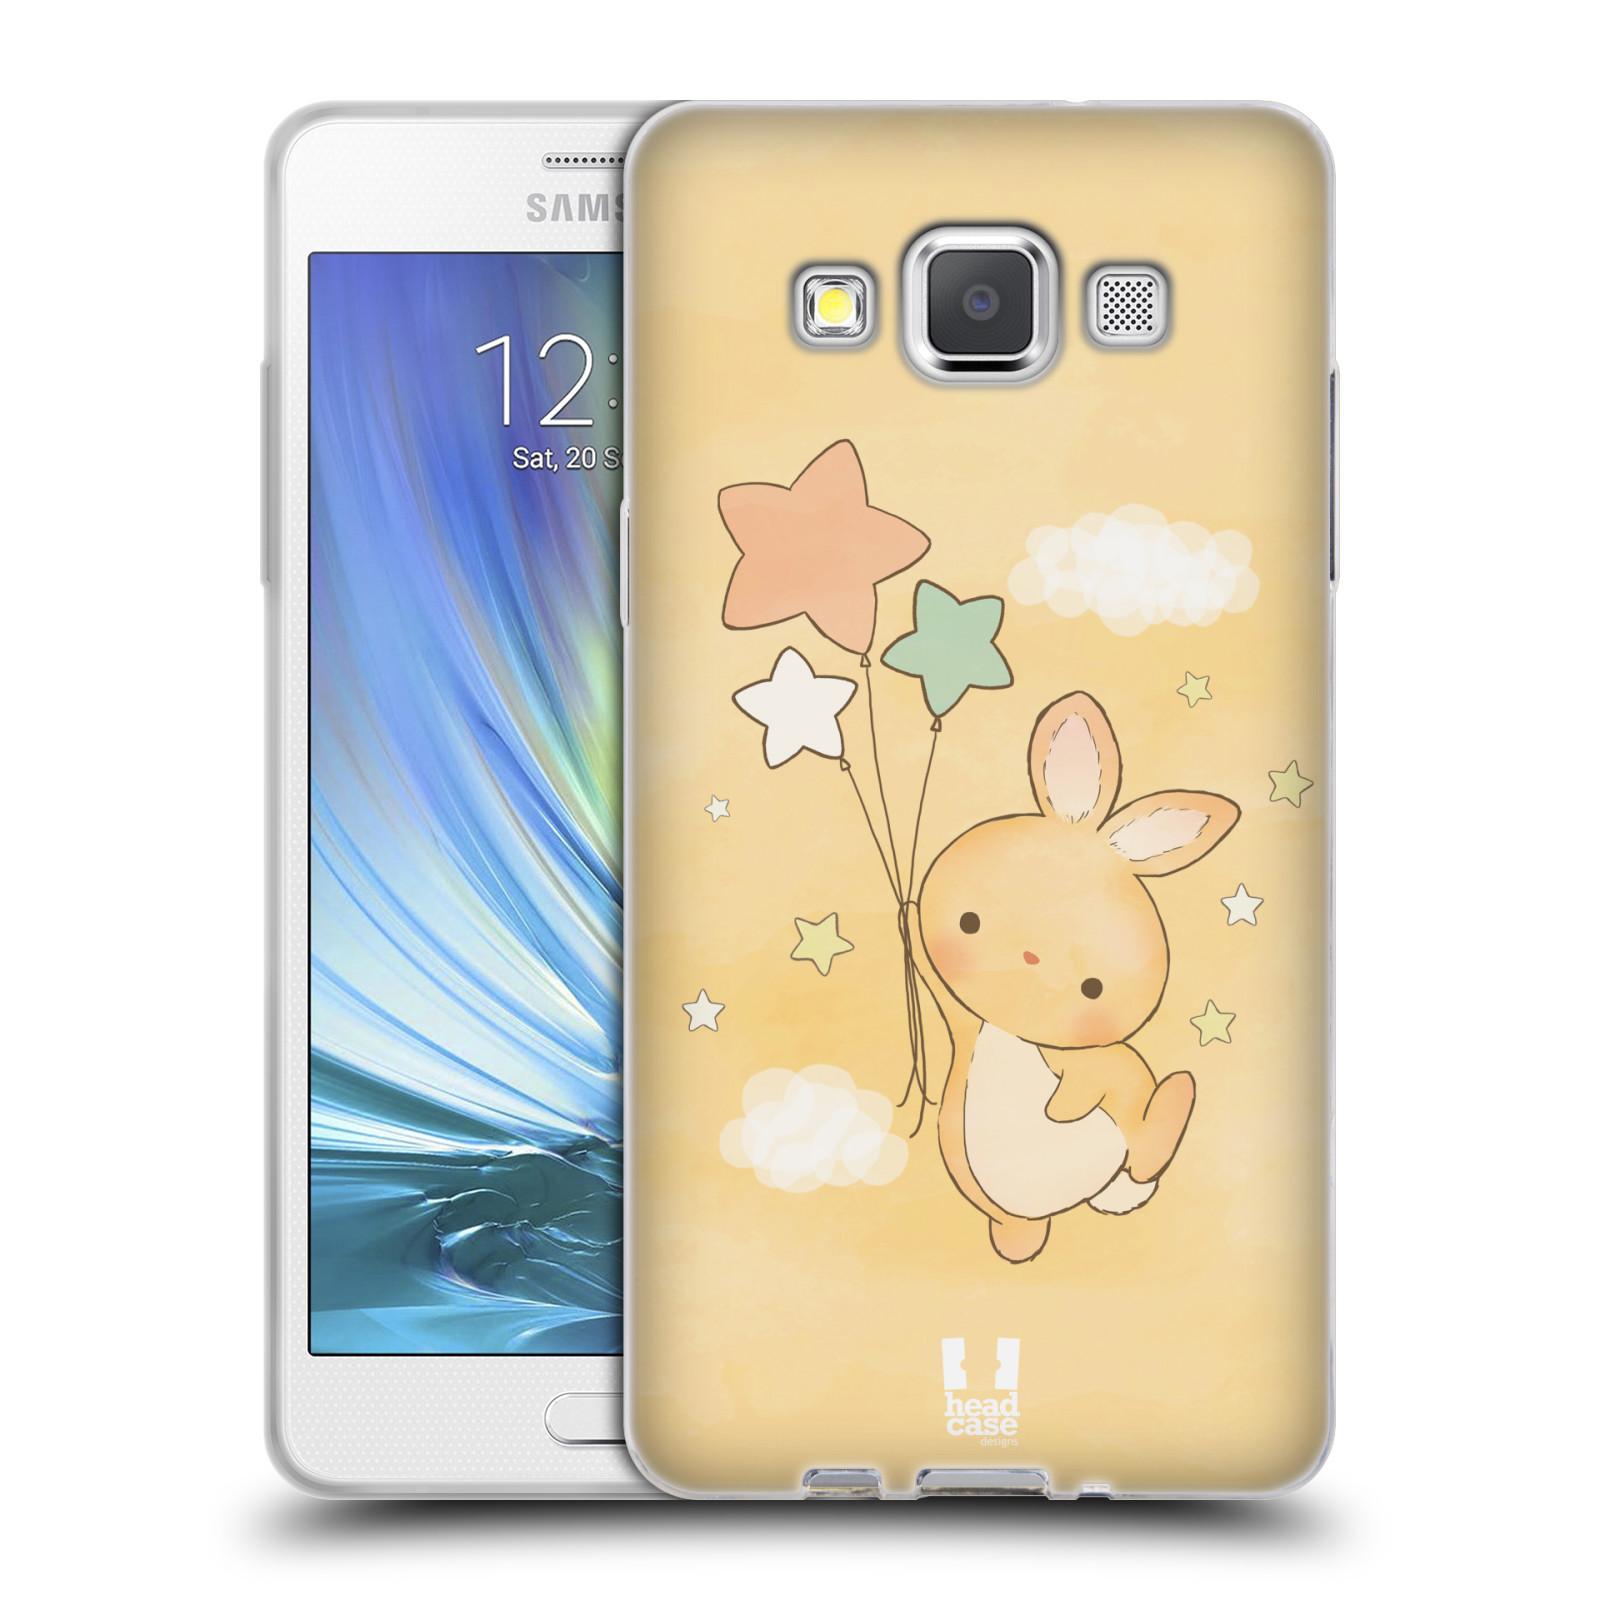 HEAD CASE silikonový obal na mobil Samsung Galaxy A5 vzor králíček a hvězdy žlutá